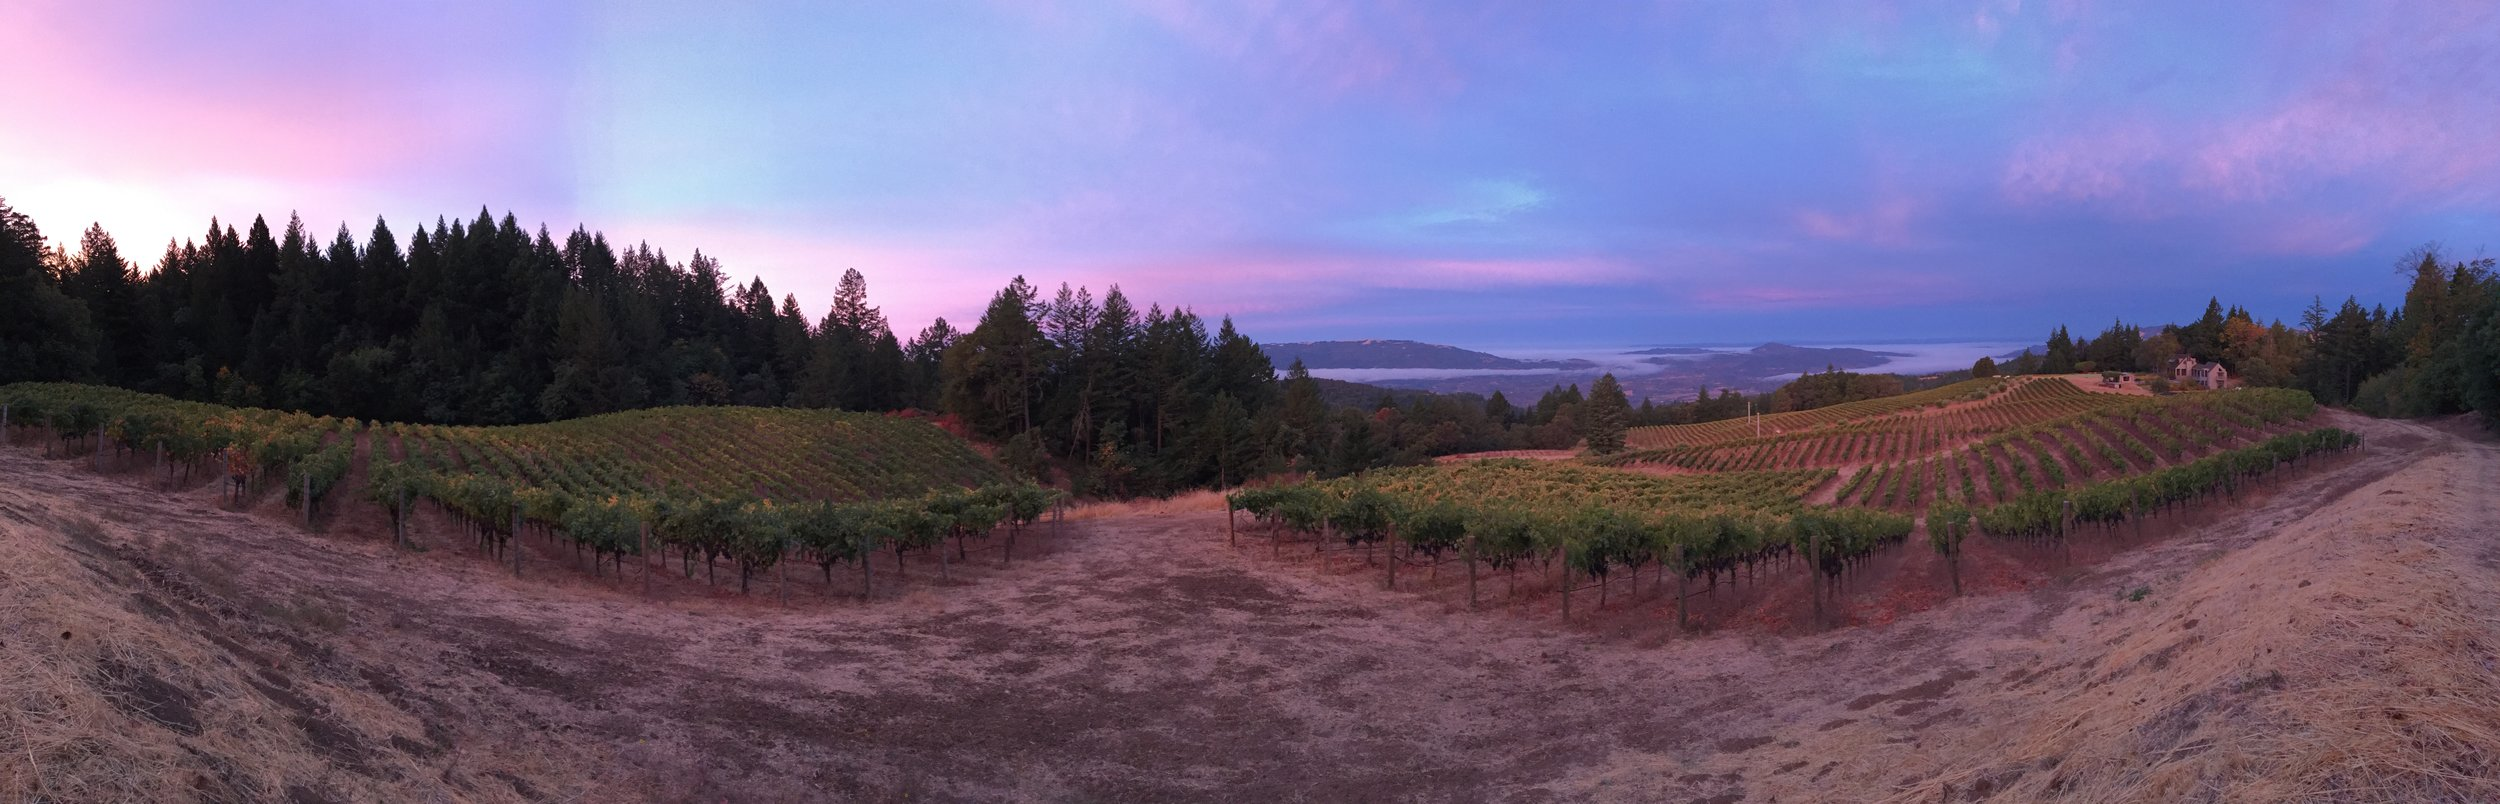 MoonRidge Vineyard Sunrise